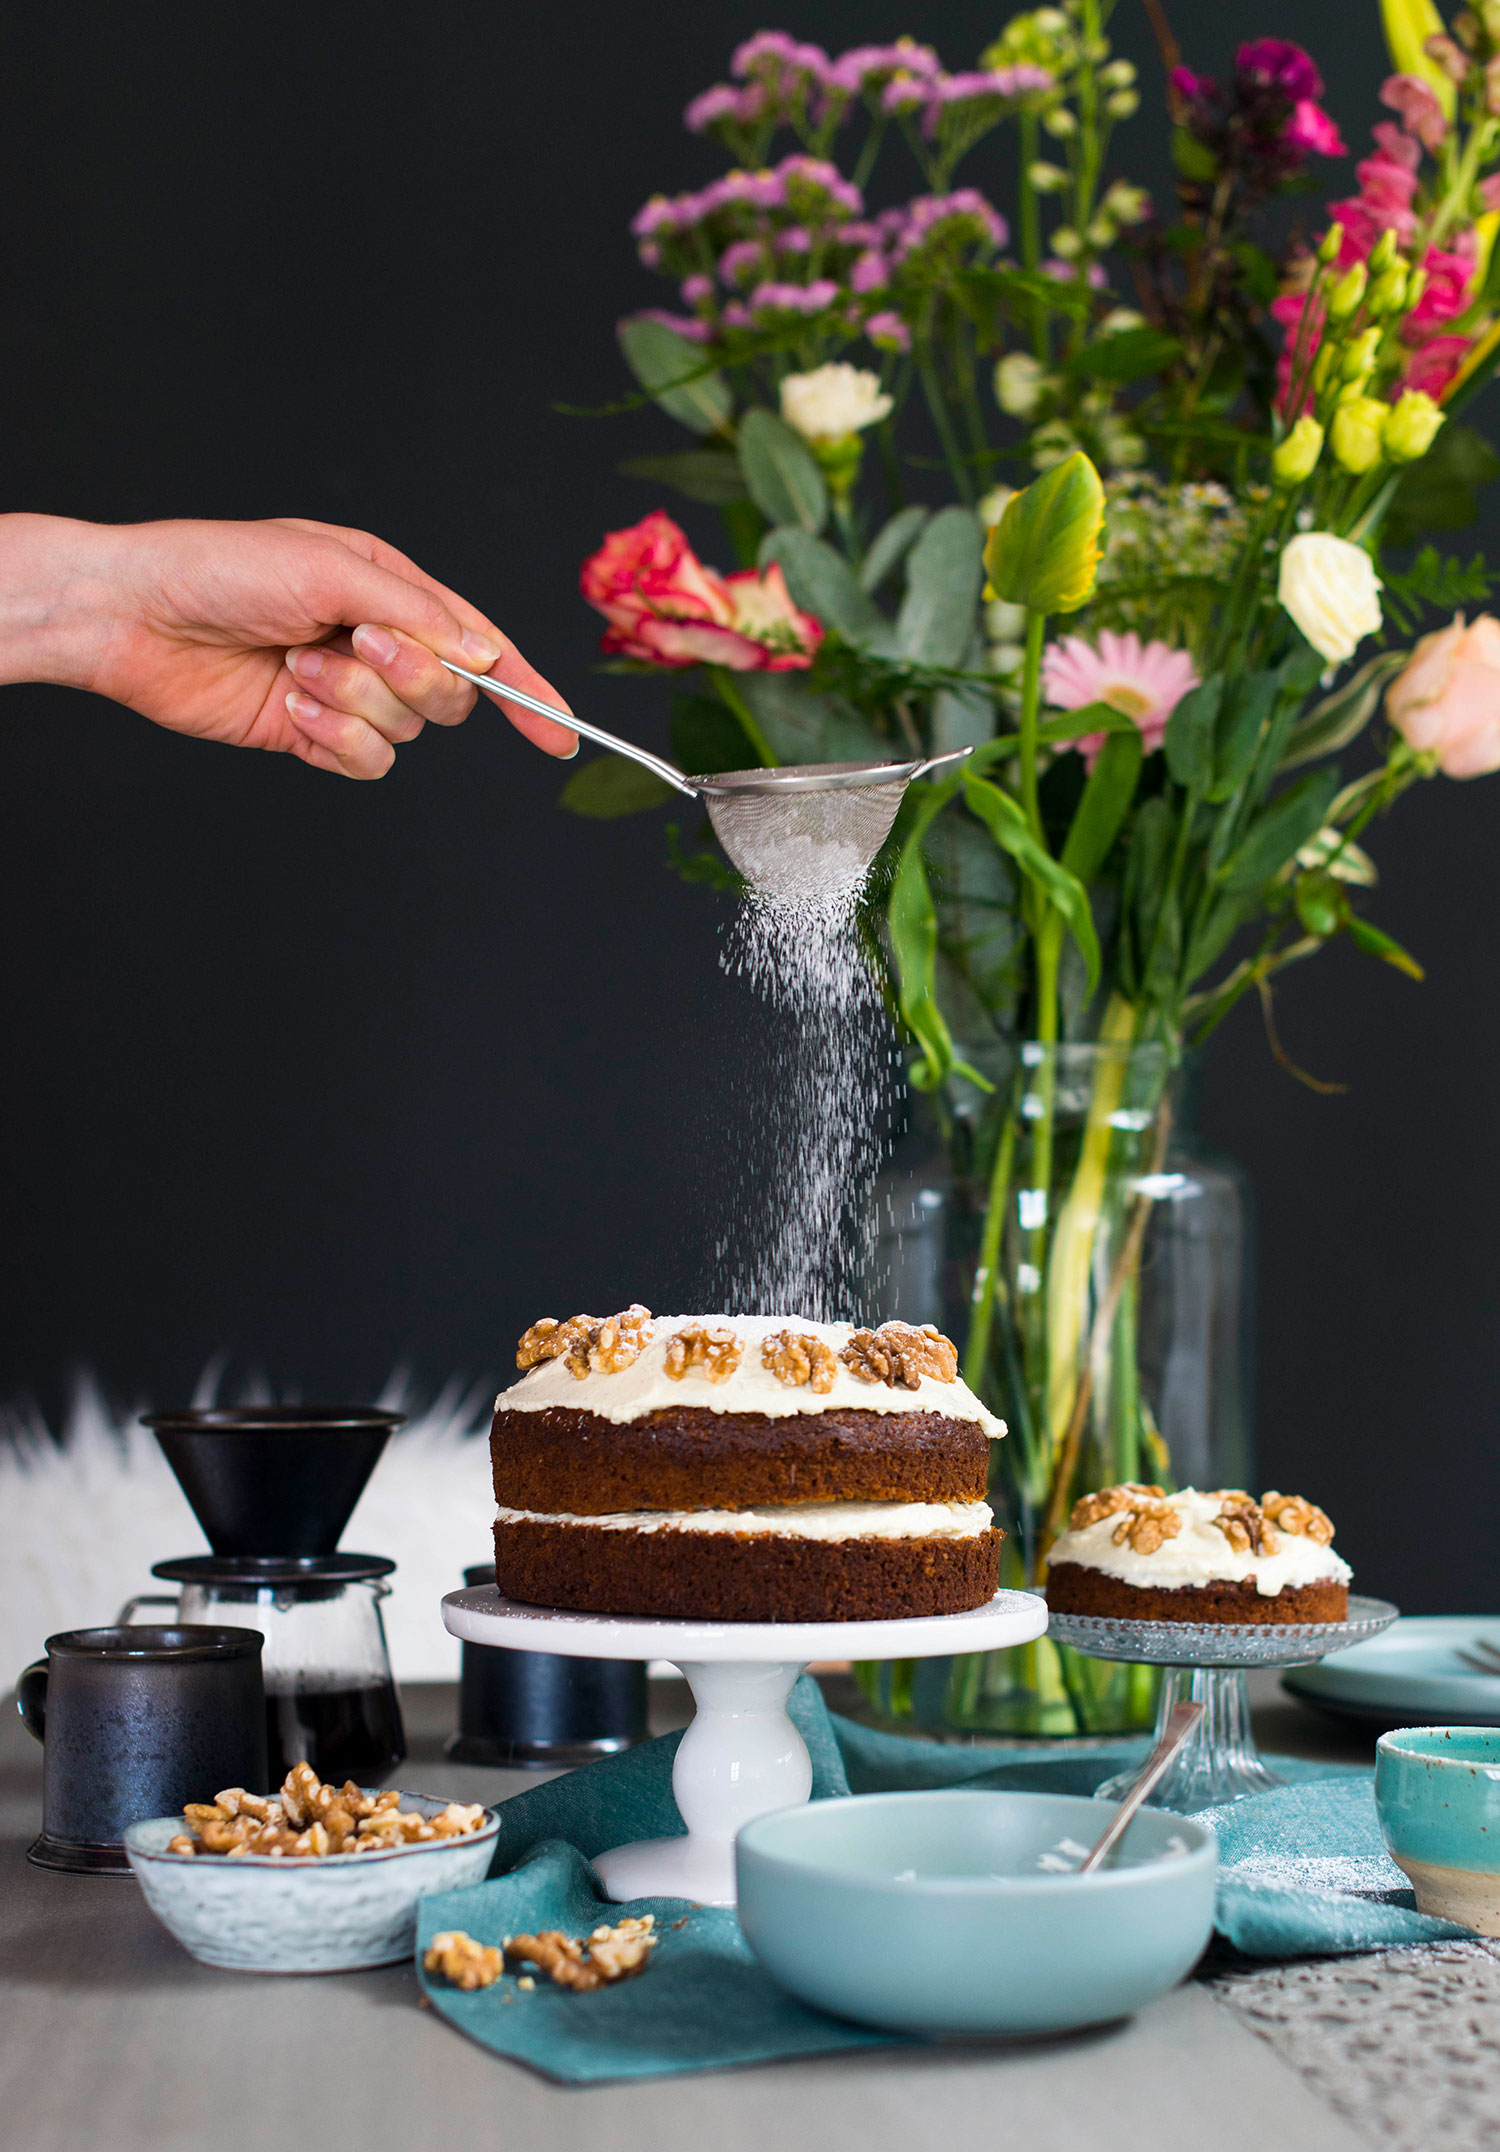 Carrot-Cake-Frischkäse-Frosting-4